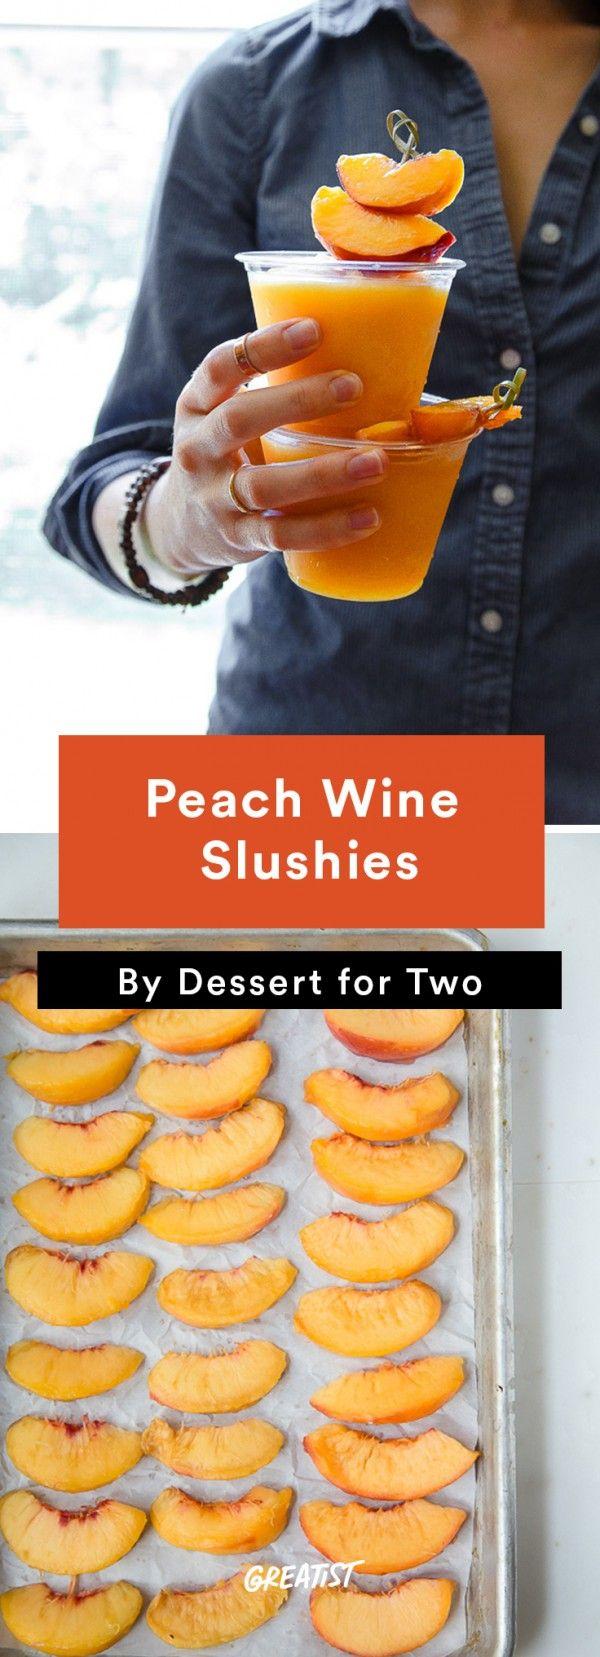 Get the recipe Peach Wine Slushies @recipes_to_go